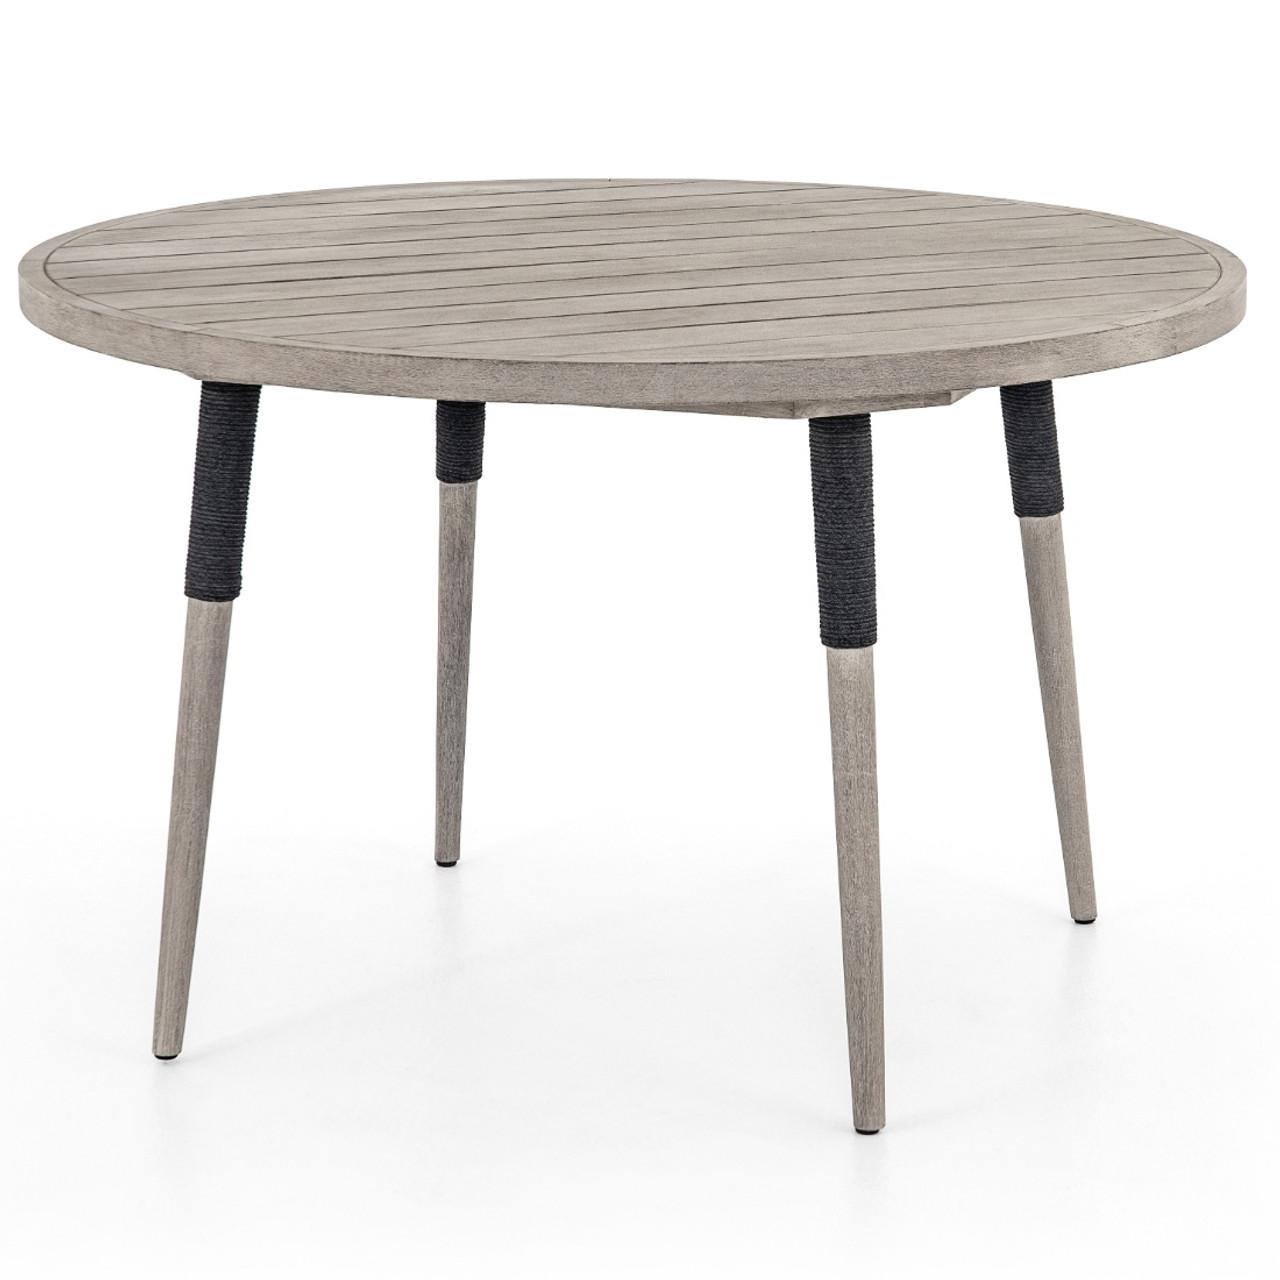 Sana Grey Teak Top Round Outdoor Dining Table 48 Zin Home